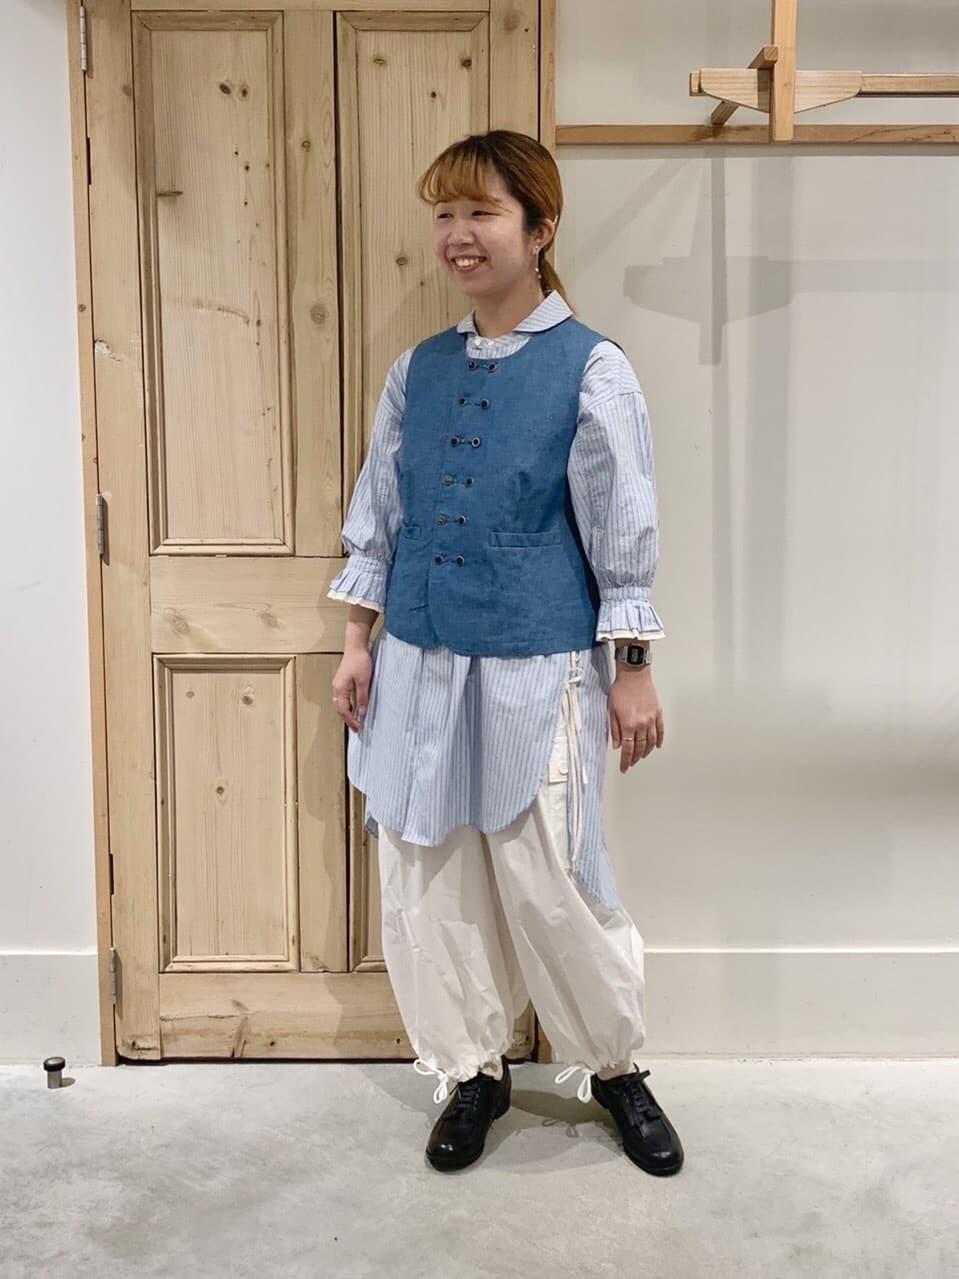 Malle chambre de charme 調布パルコ 身長:155cm 2021.08.06